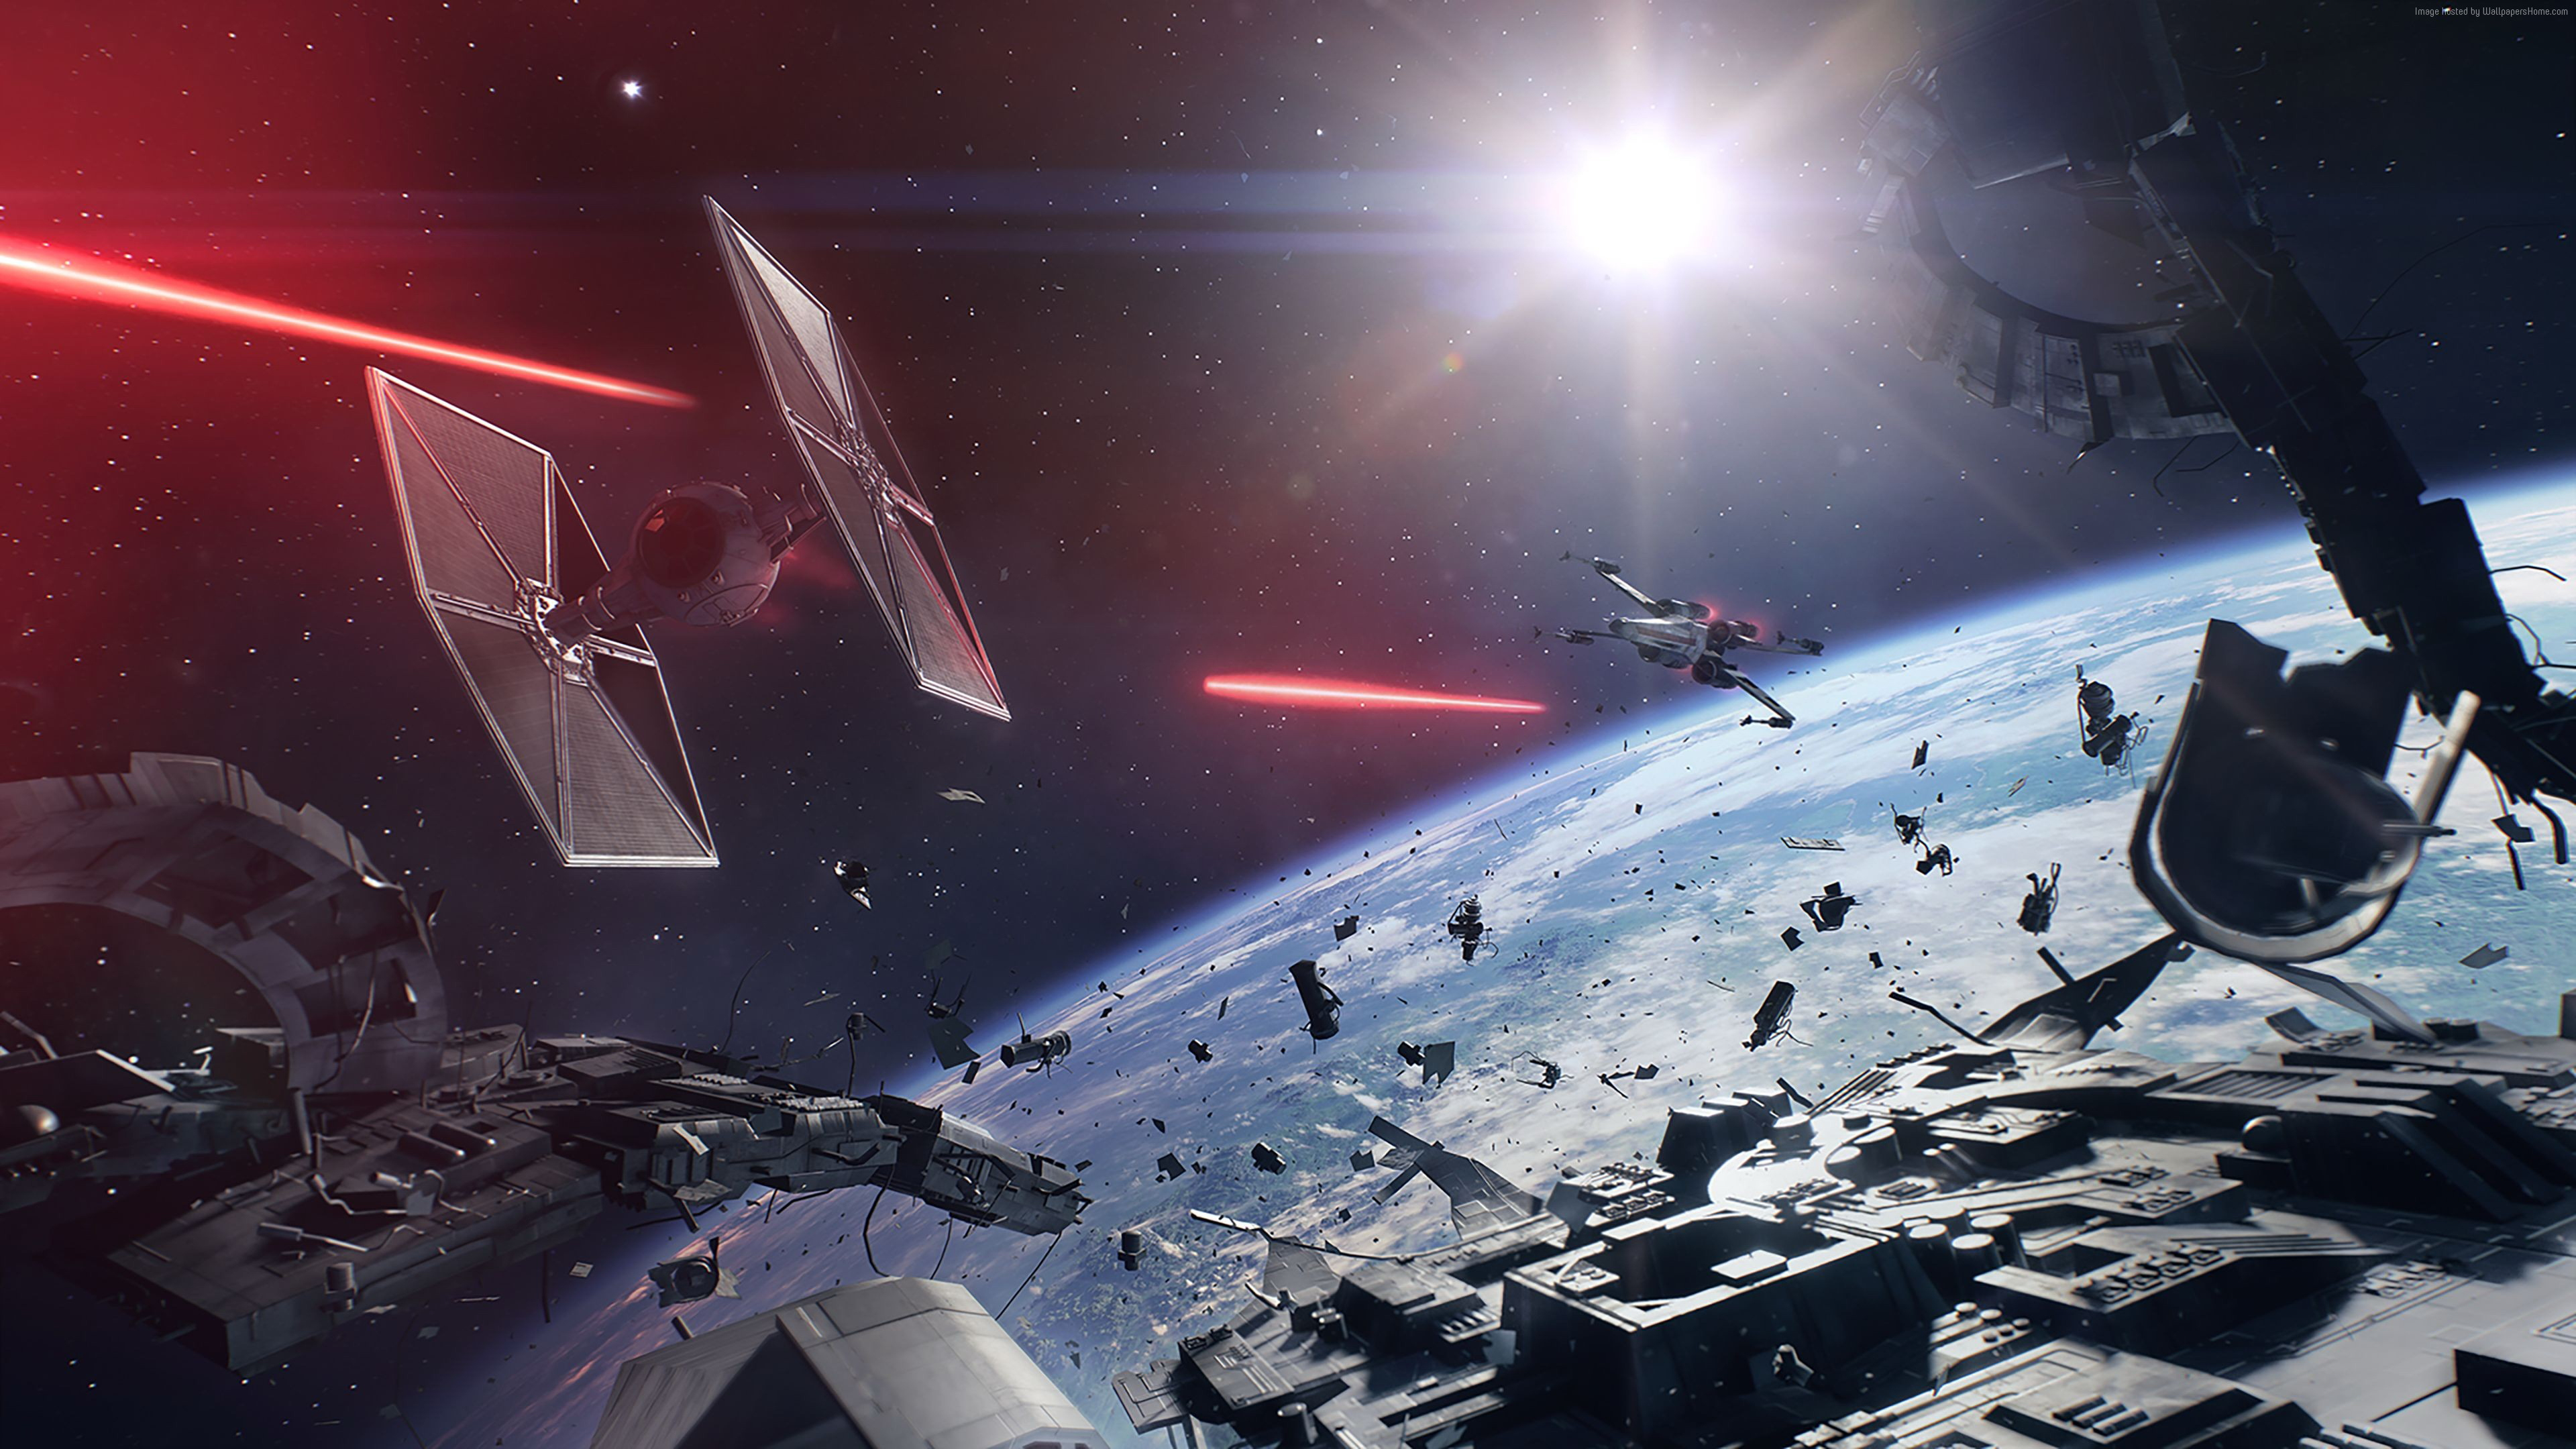 Desktop Wallpapers Star Wars Battlefront Ii 2017 Starship 3840x2160